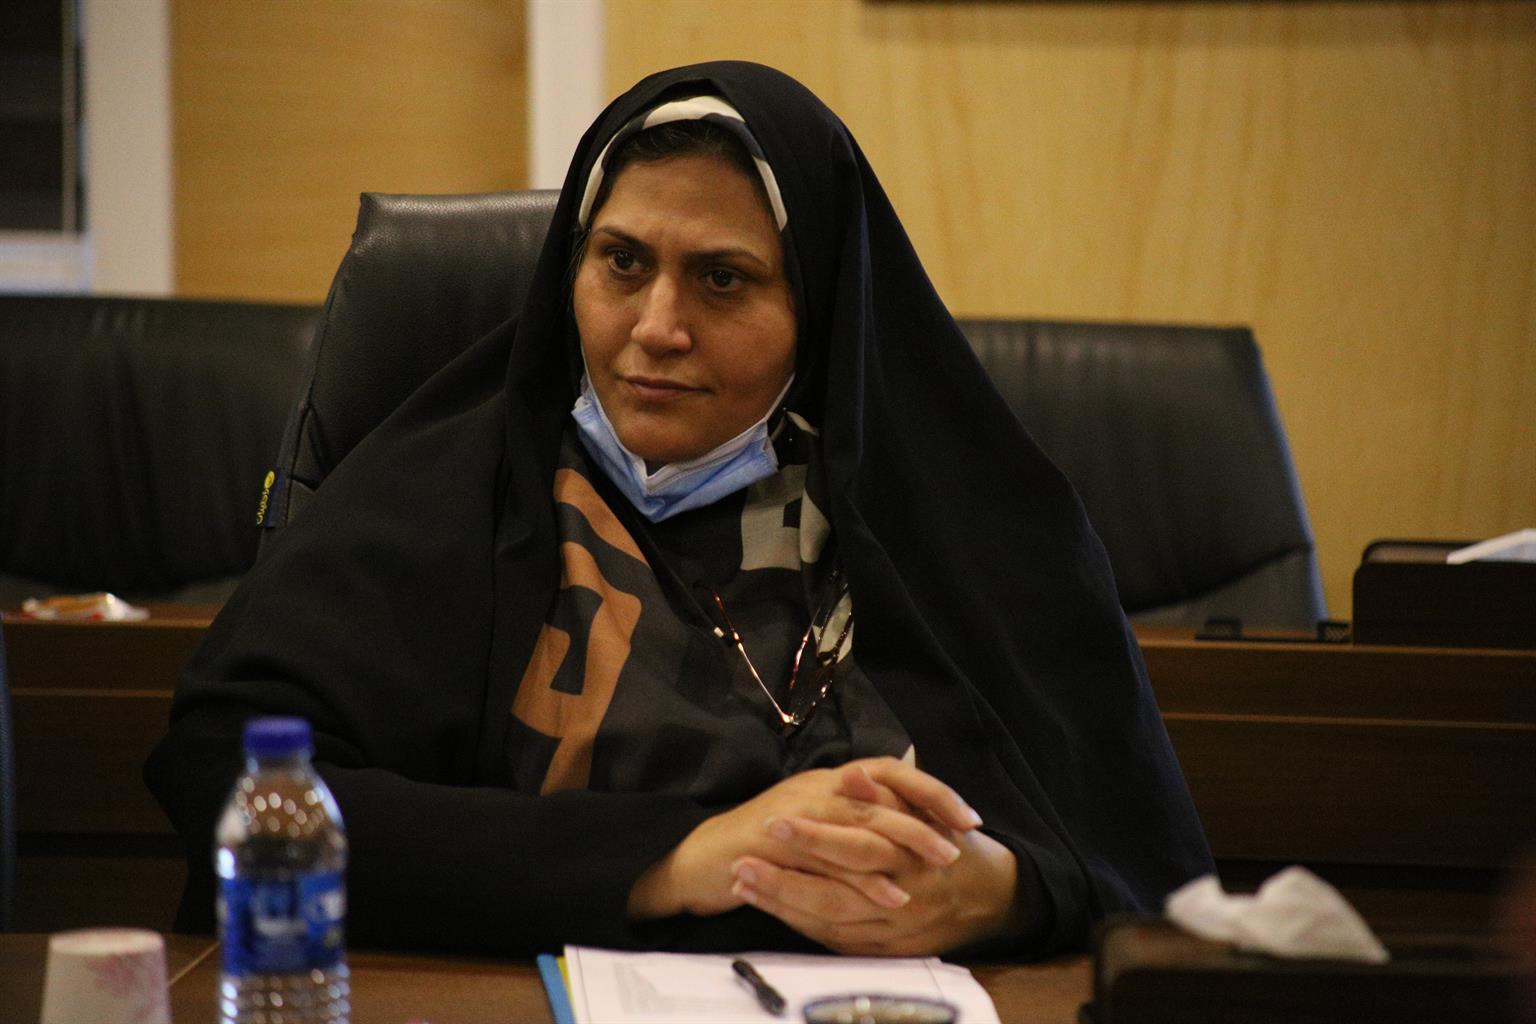 img 125456 - جلسه هماهنگی آماده سازی ماشین آلات عمرانی شهرداری رشت برگزار شد